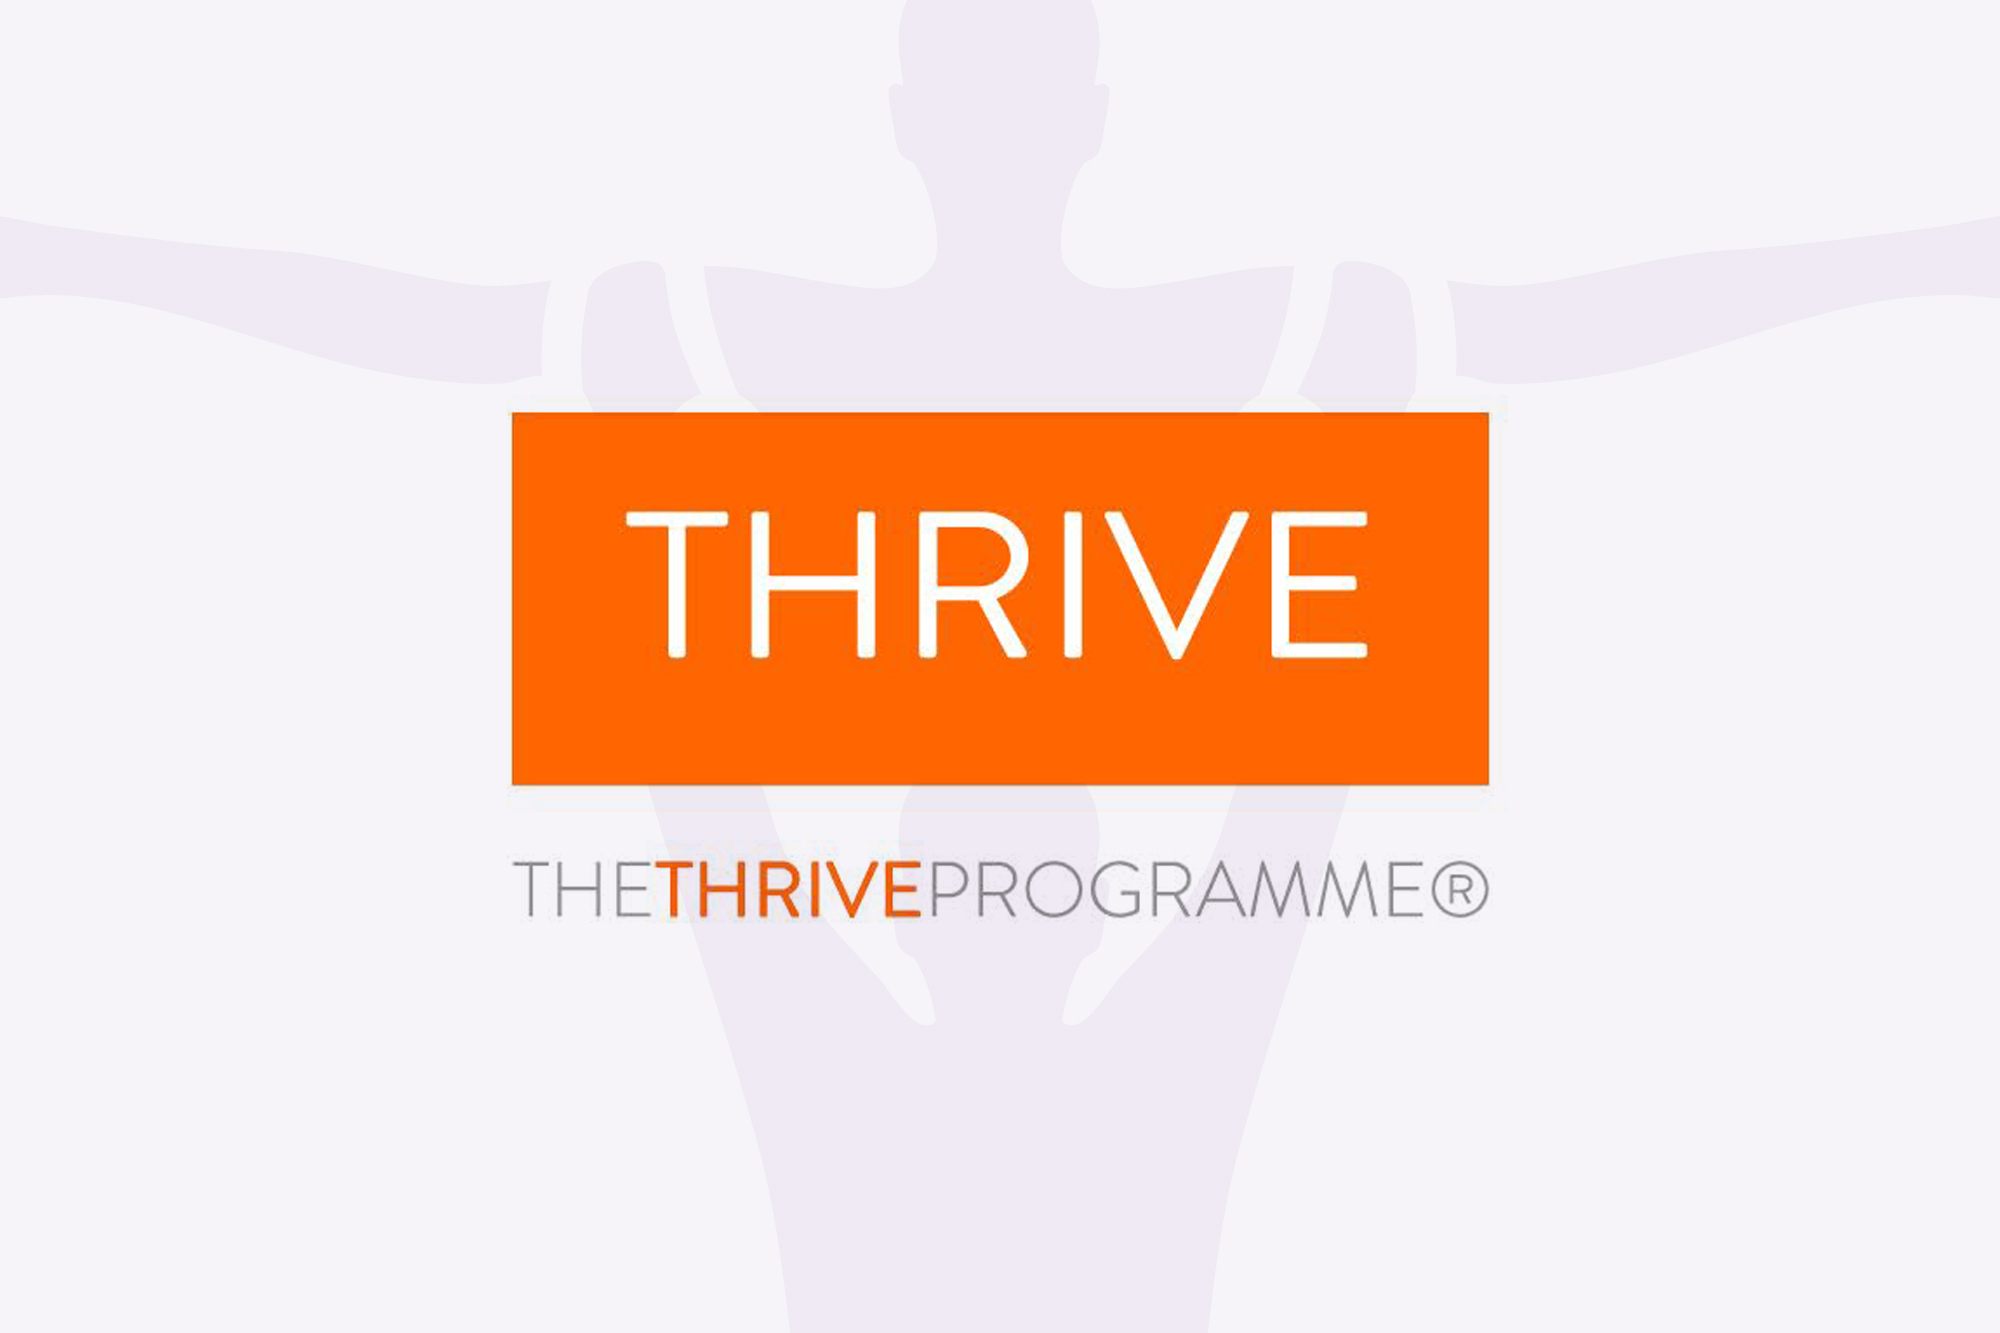 the thrive programme logo